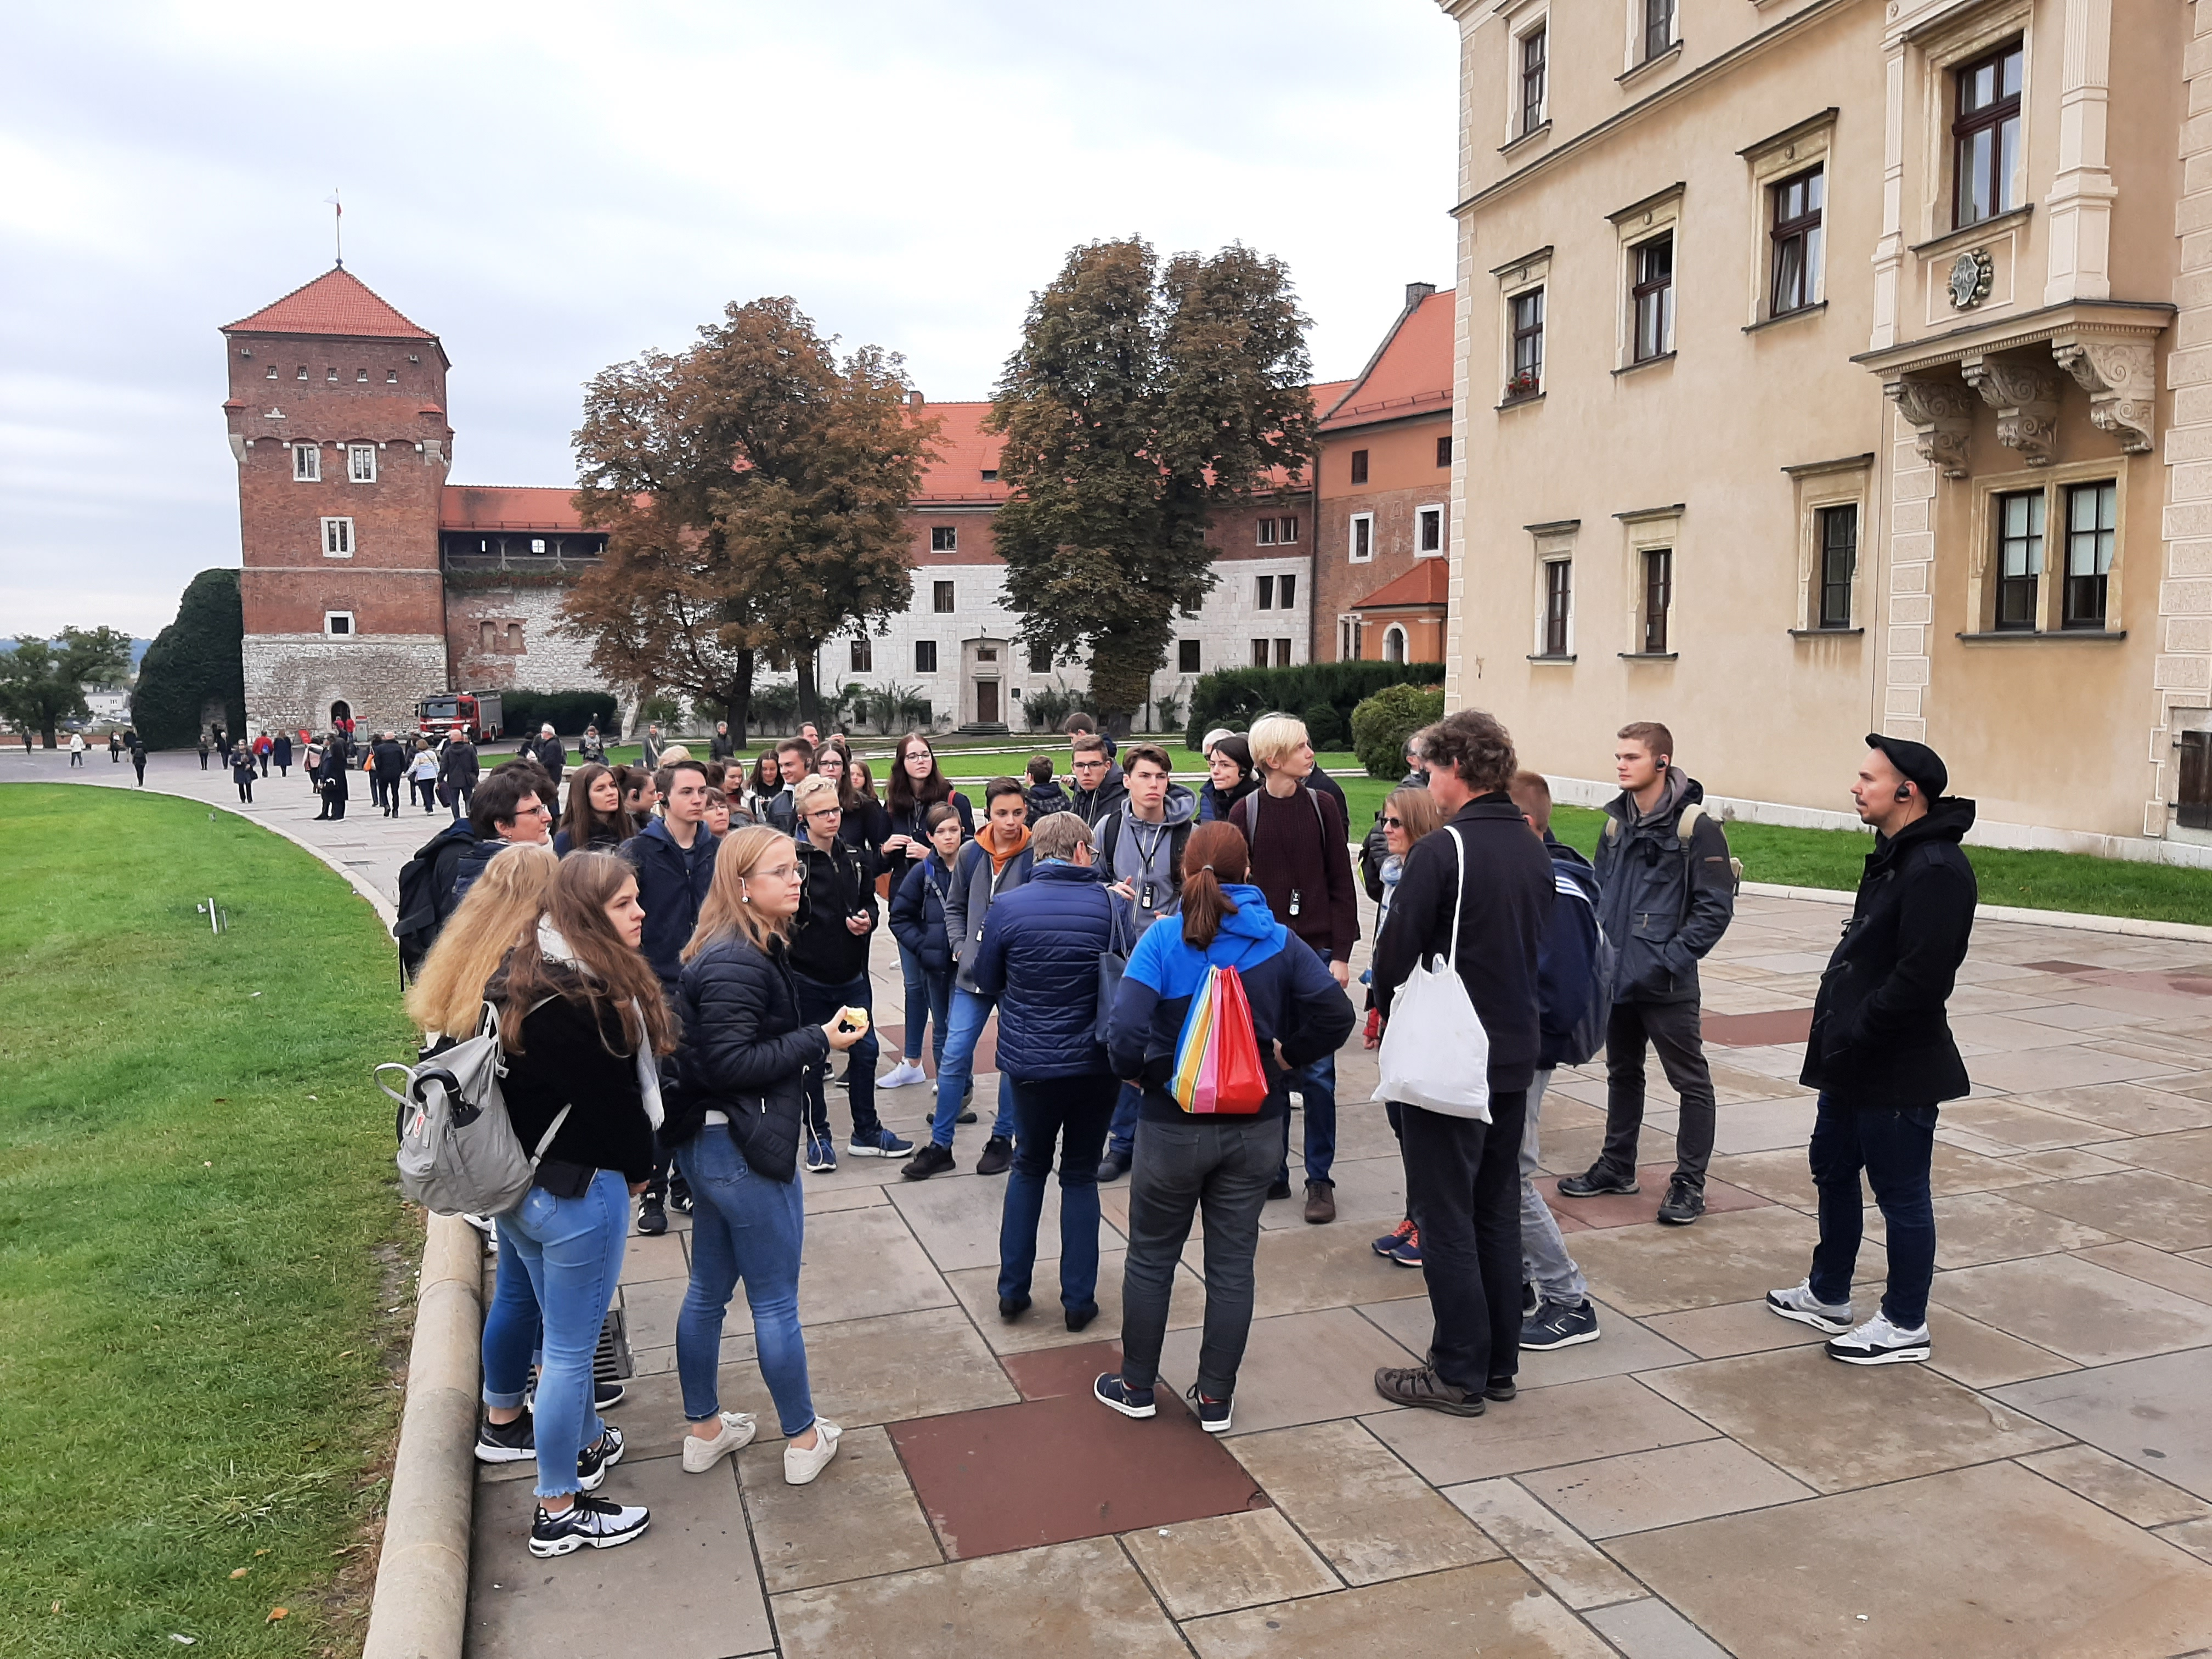 Krakau - Burg Wawel